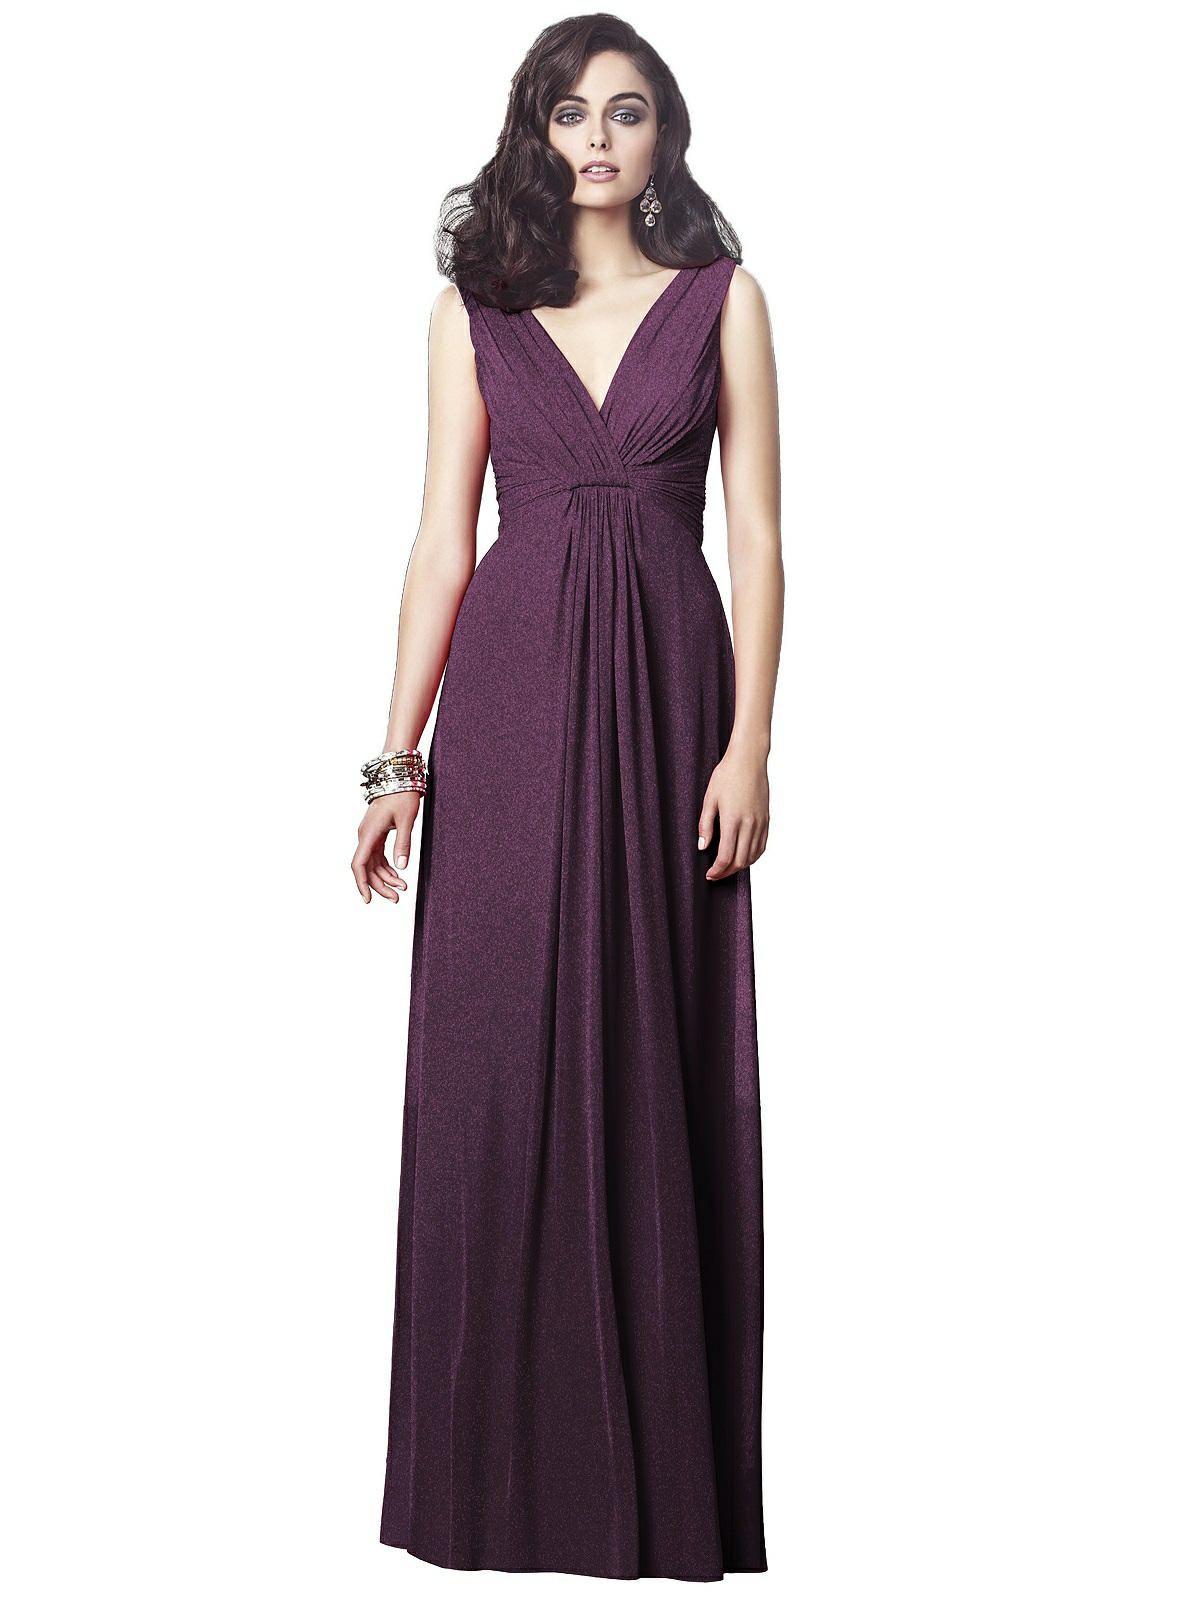 02ad1532b312 Dessy Shimmer Bridesmaid Dress 2907LS in 2019 | Dessy Bridesmaid ...